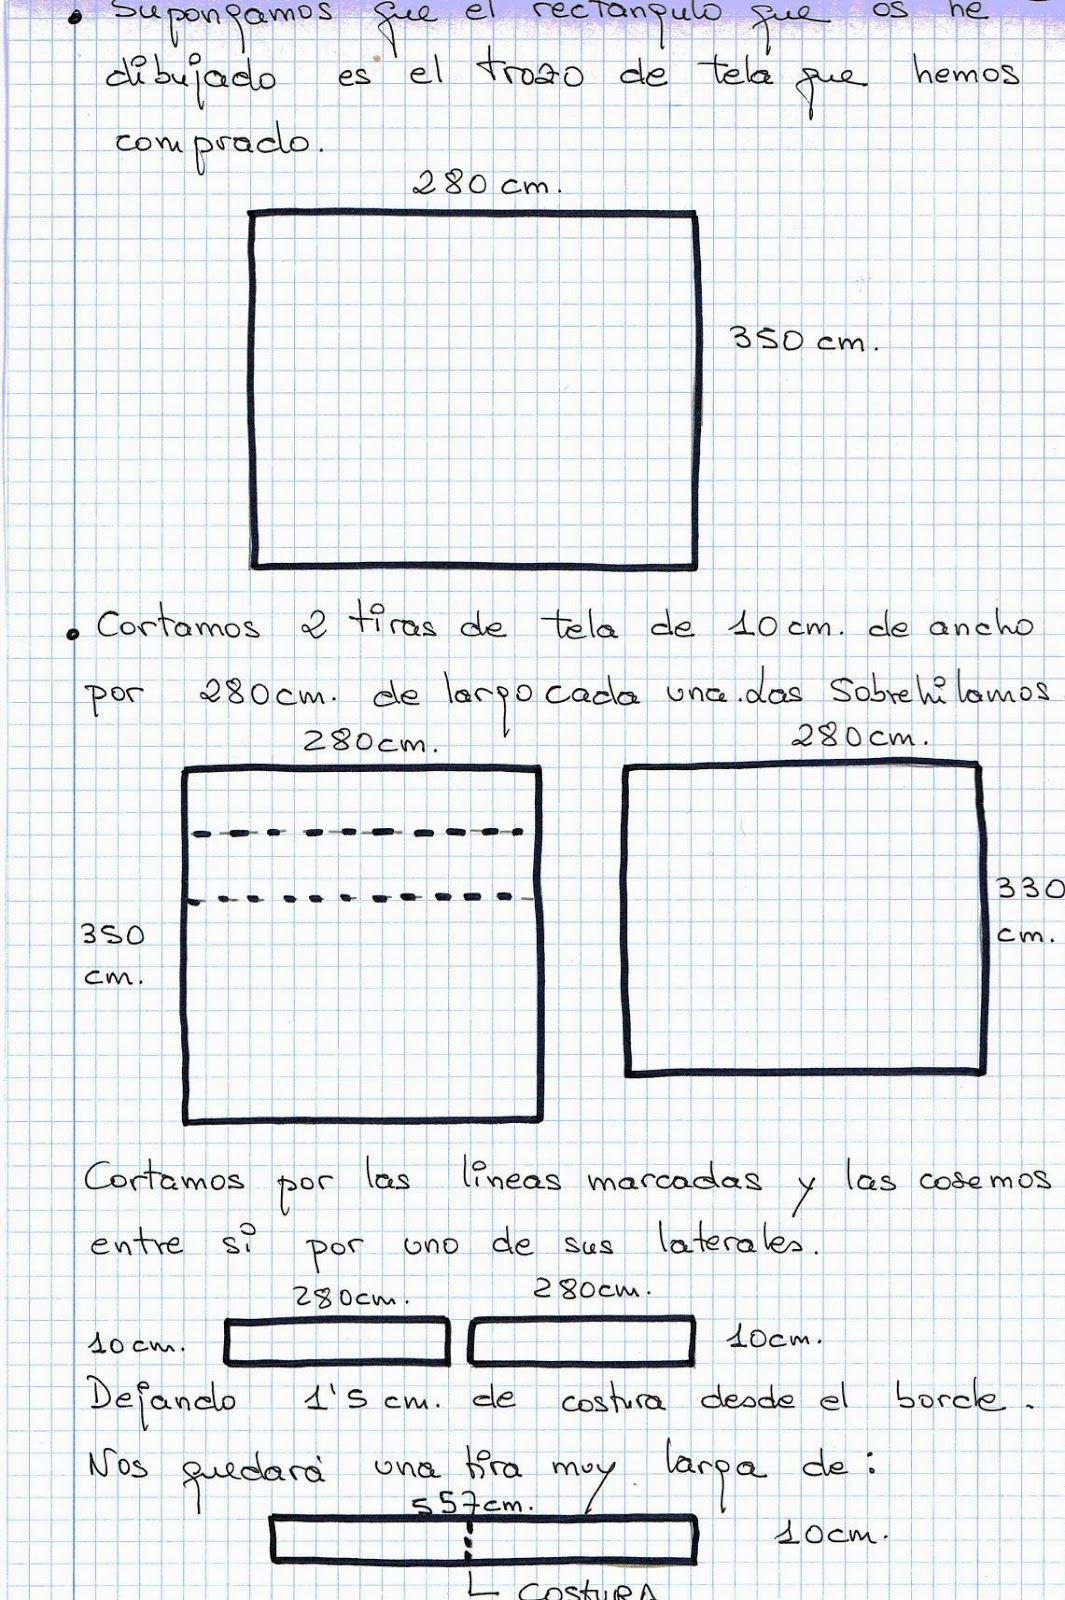 Blog sobre costura confecci n de ropa para el hogar - Vestir mesa camilla ...